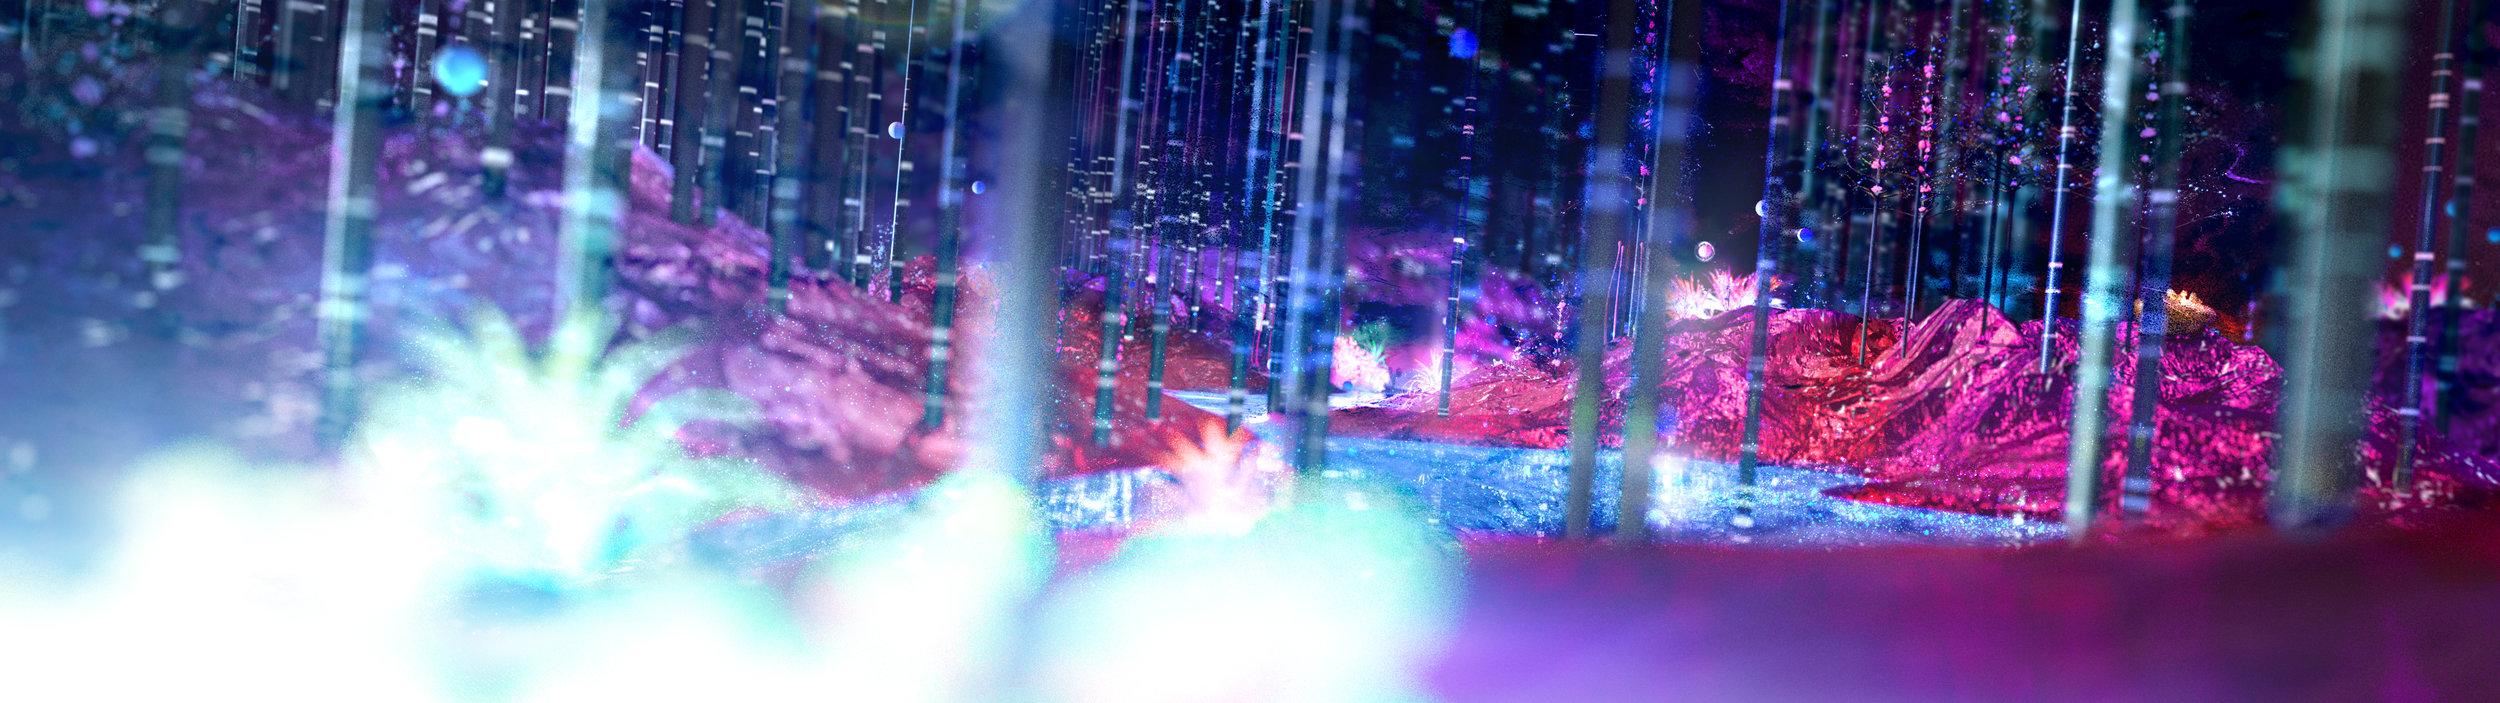 Luminescent_Forest_Design02.jpg